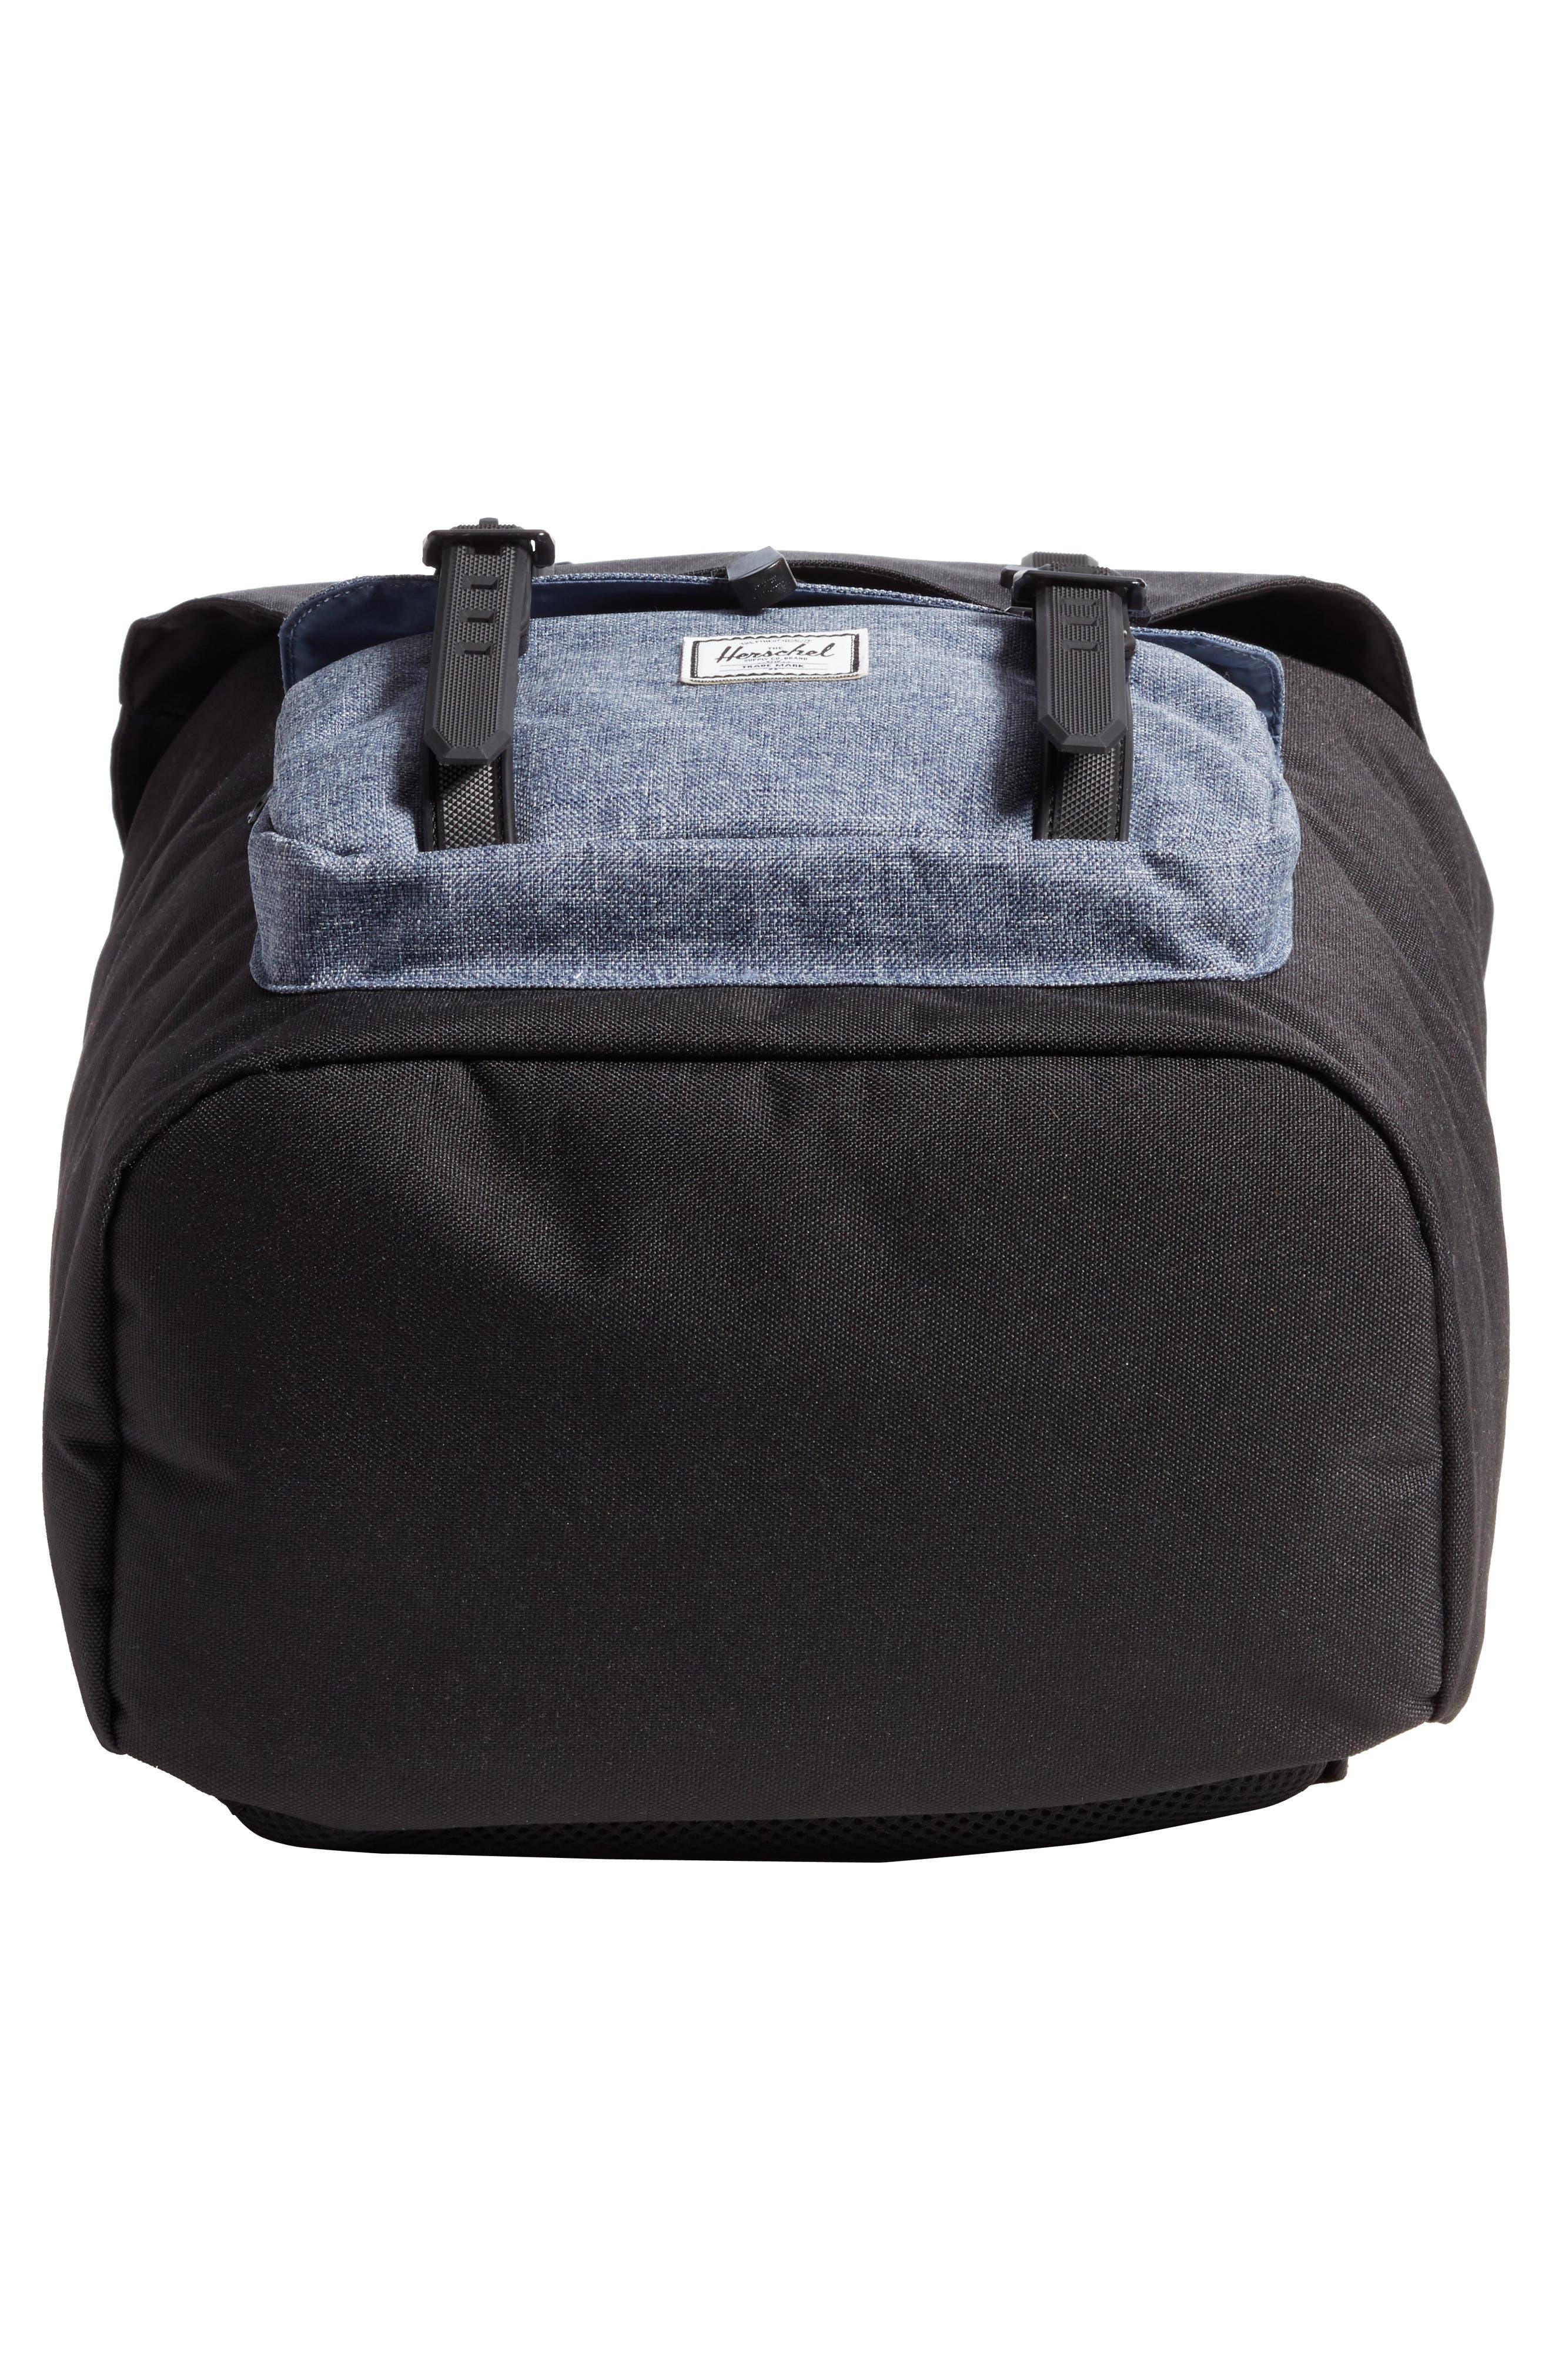 Little America - Chambray Backpack,                             Alternate thumbnail 6, color,                             Black/ Dark Chambray